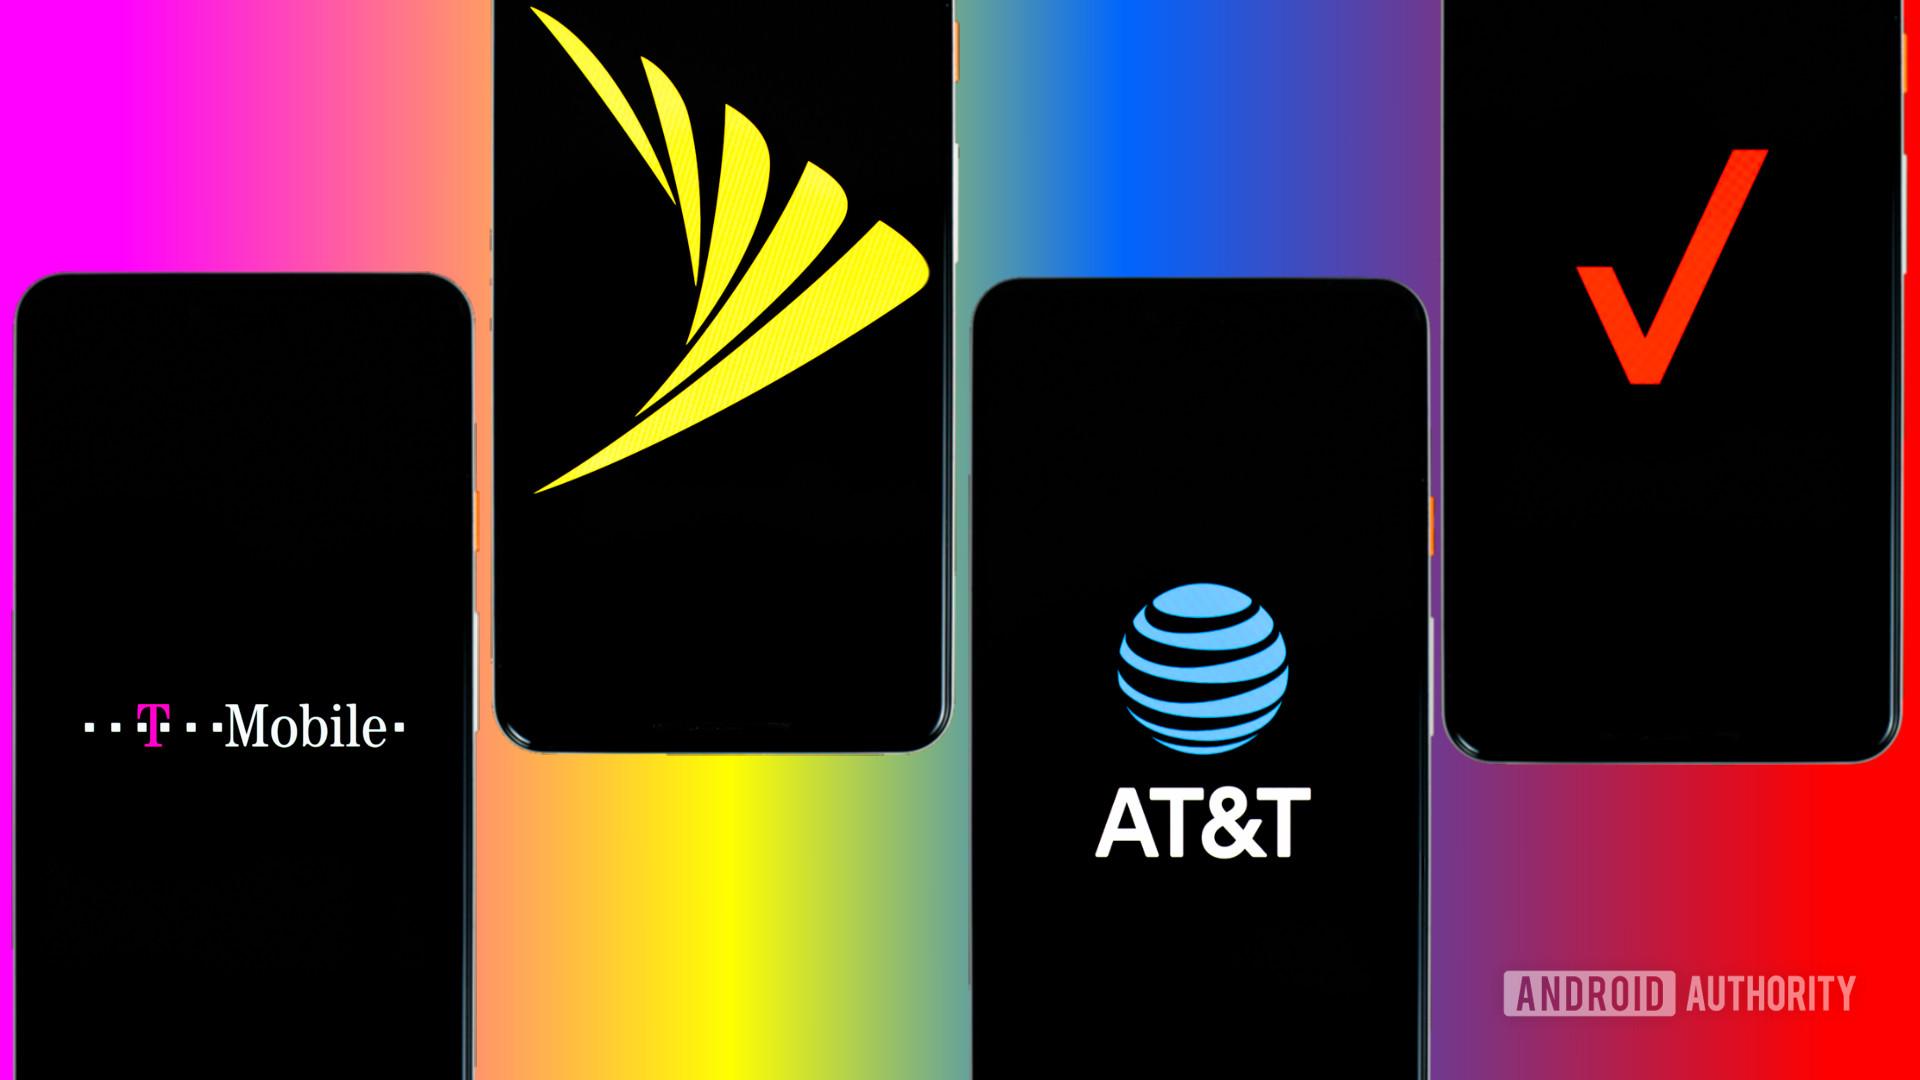 Sprint Verizon T Mobile and Verizon carriers stock photo 3